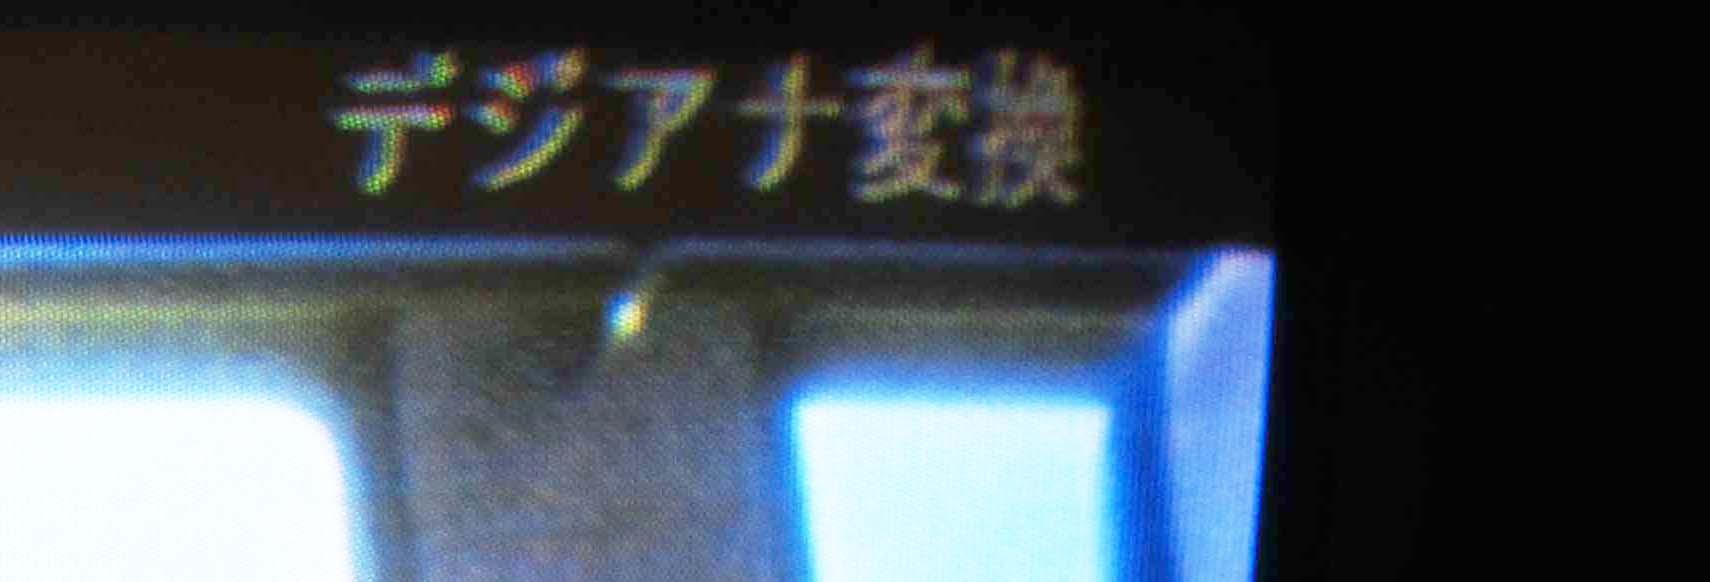 c0166765_151119.jpg